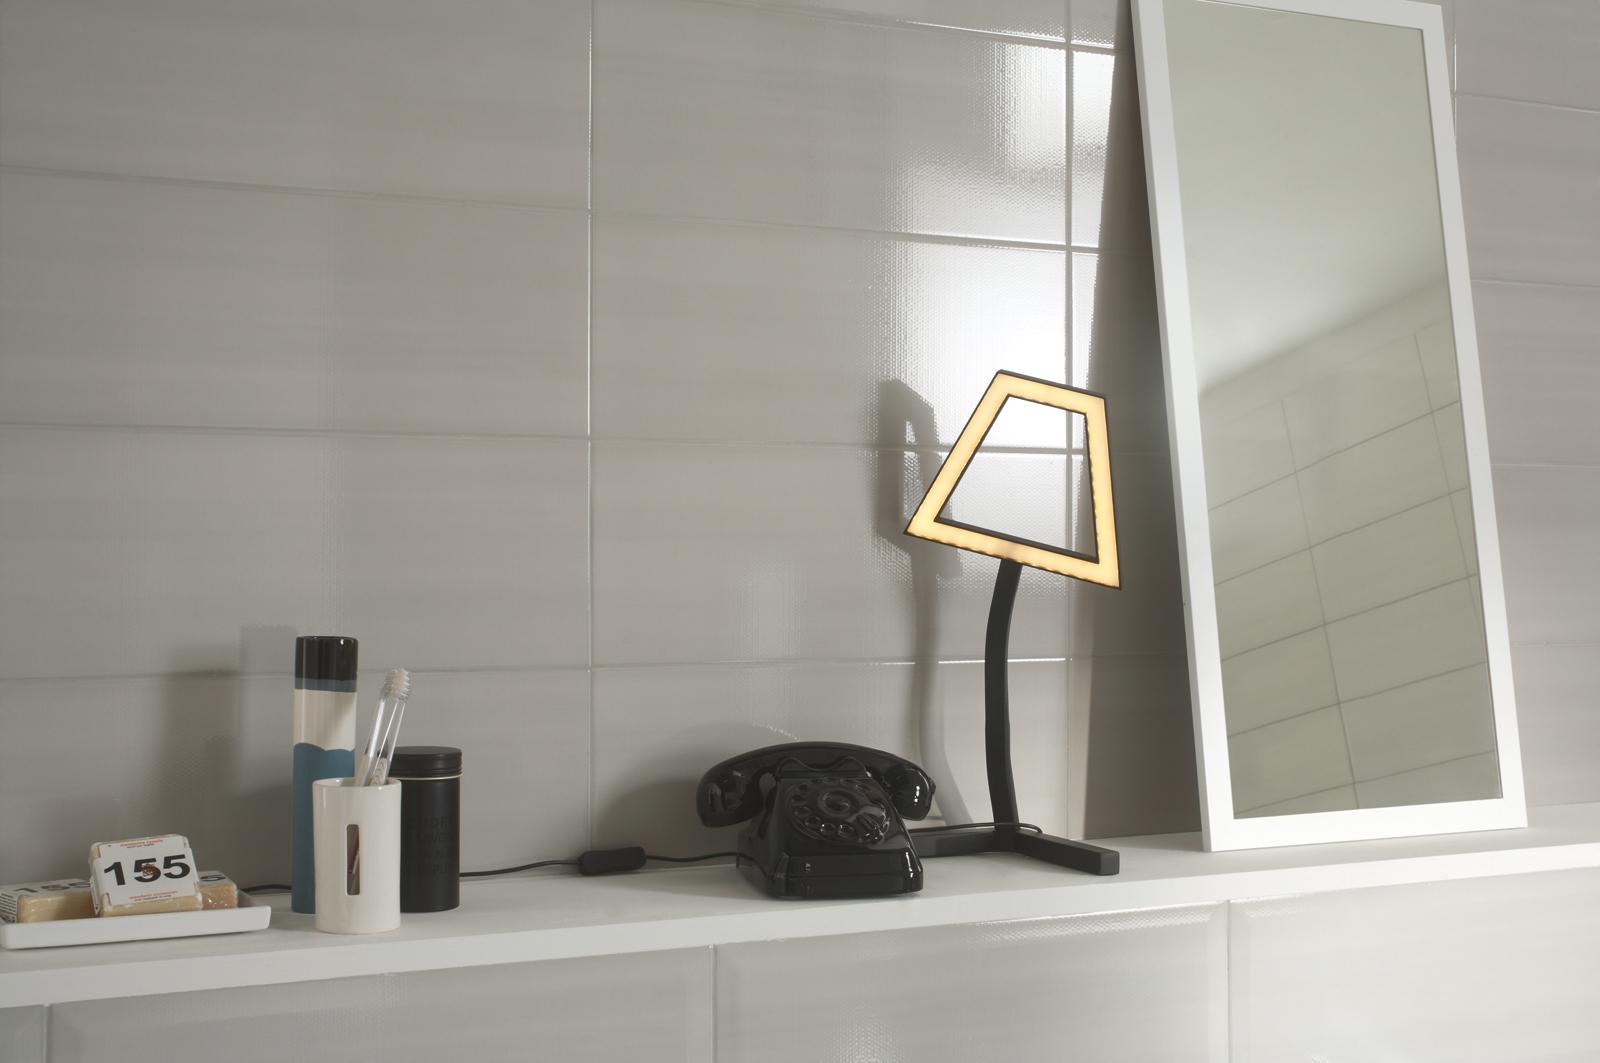 Nuance ceramic bathroom covering marazzi for Carrelage marazzi prix